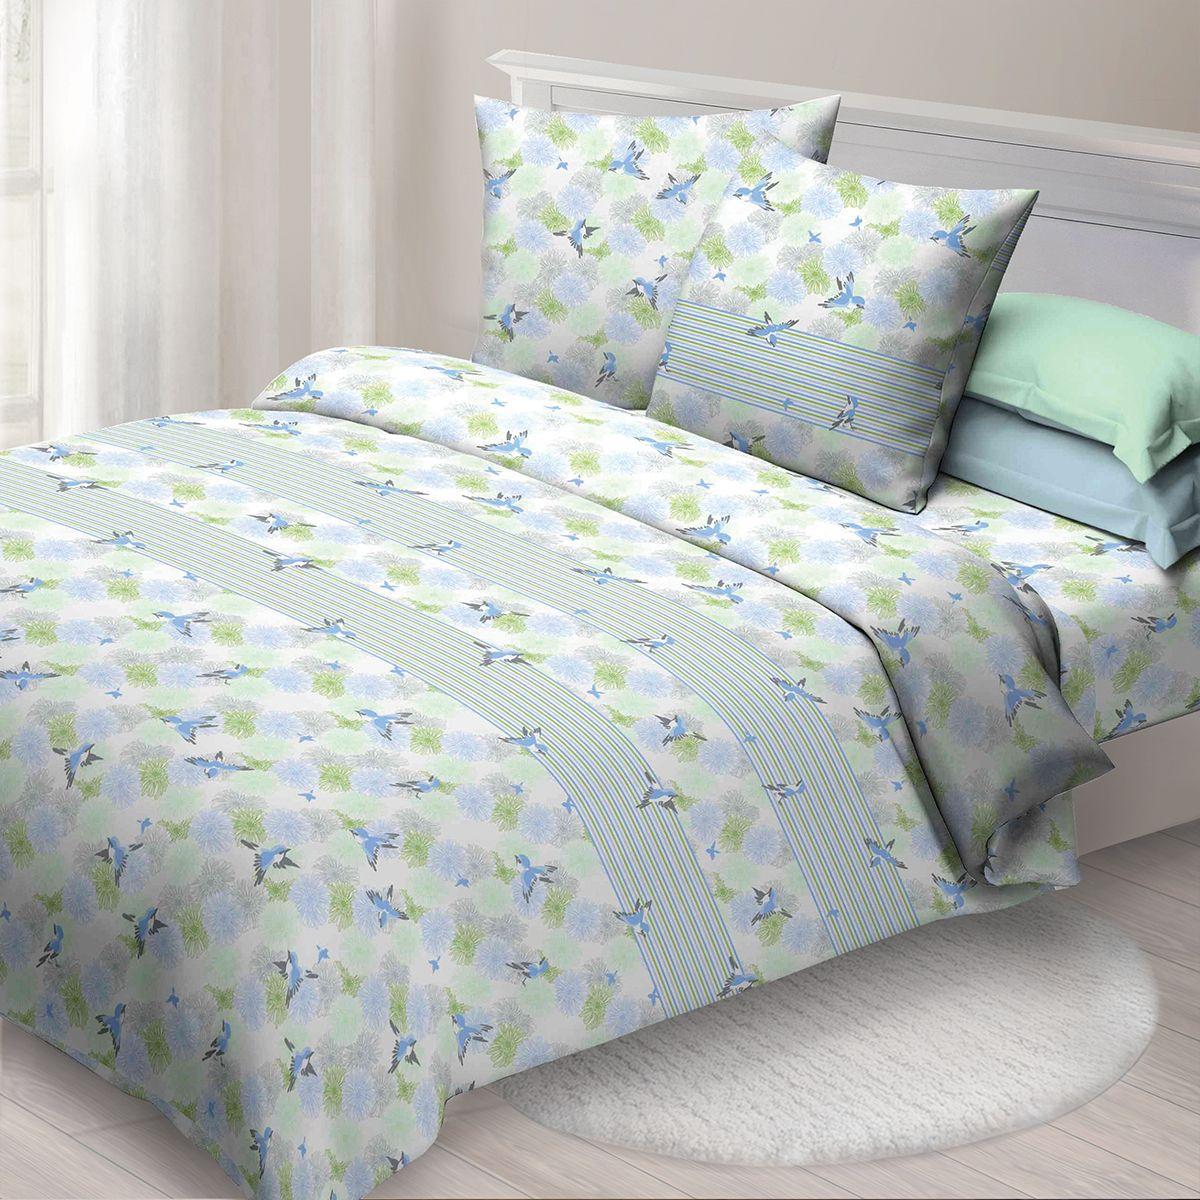 Комплект белья Спал Спалыч Ариана, 2-х спальное, наволочки 70x70, цвет: голубой. 4085-284195